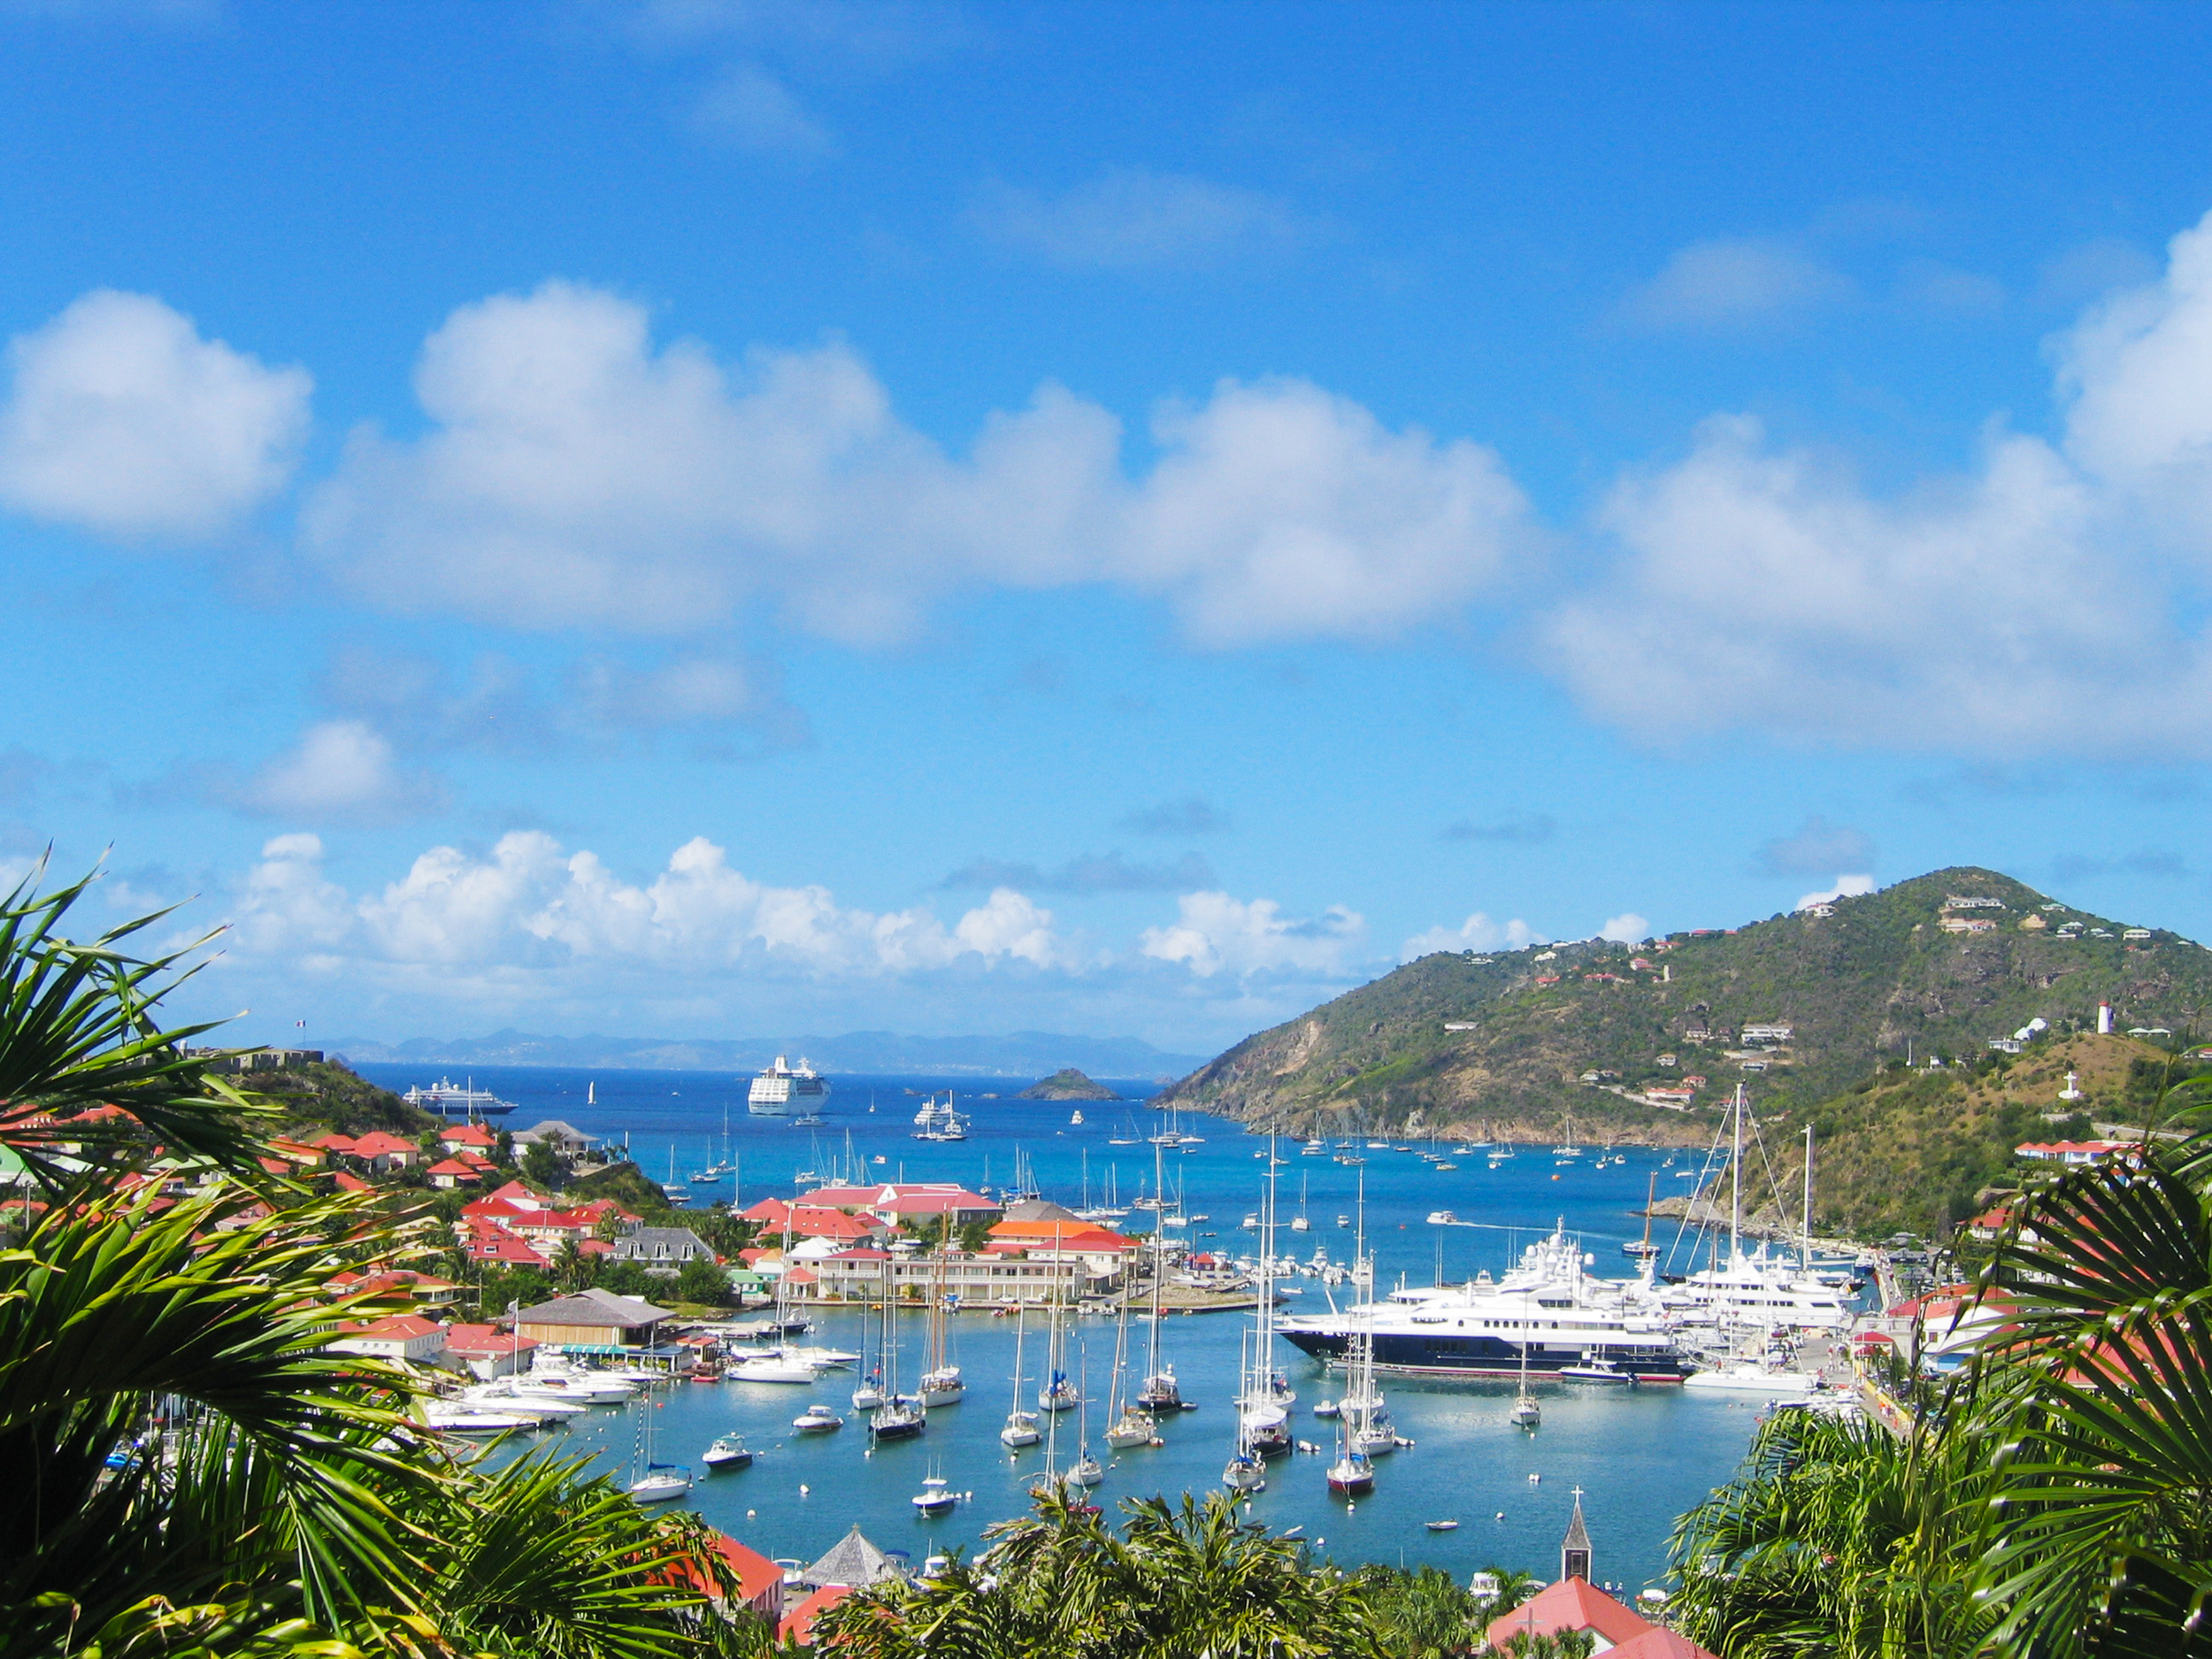 Ariel View at Gustavia Harbor